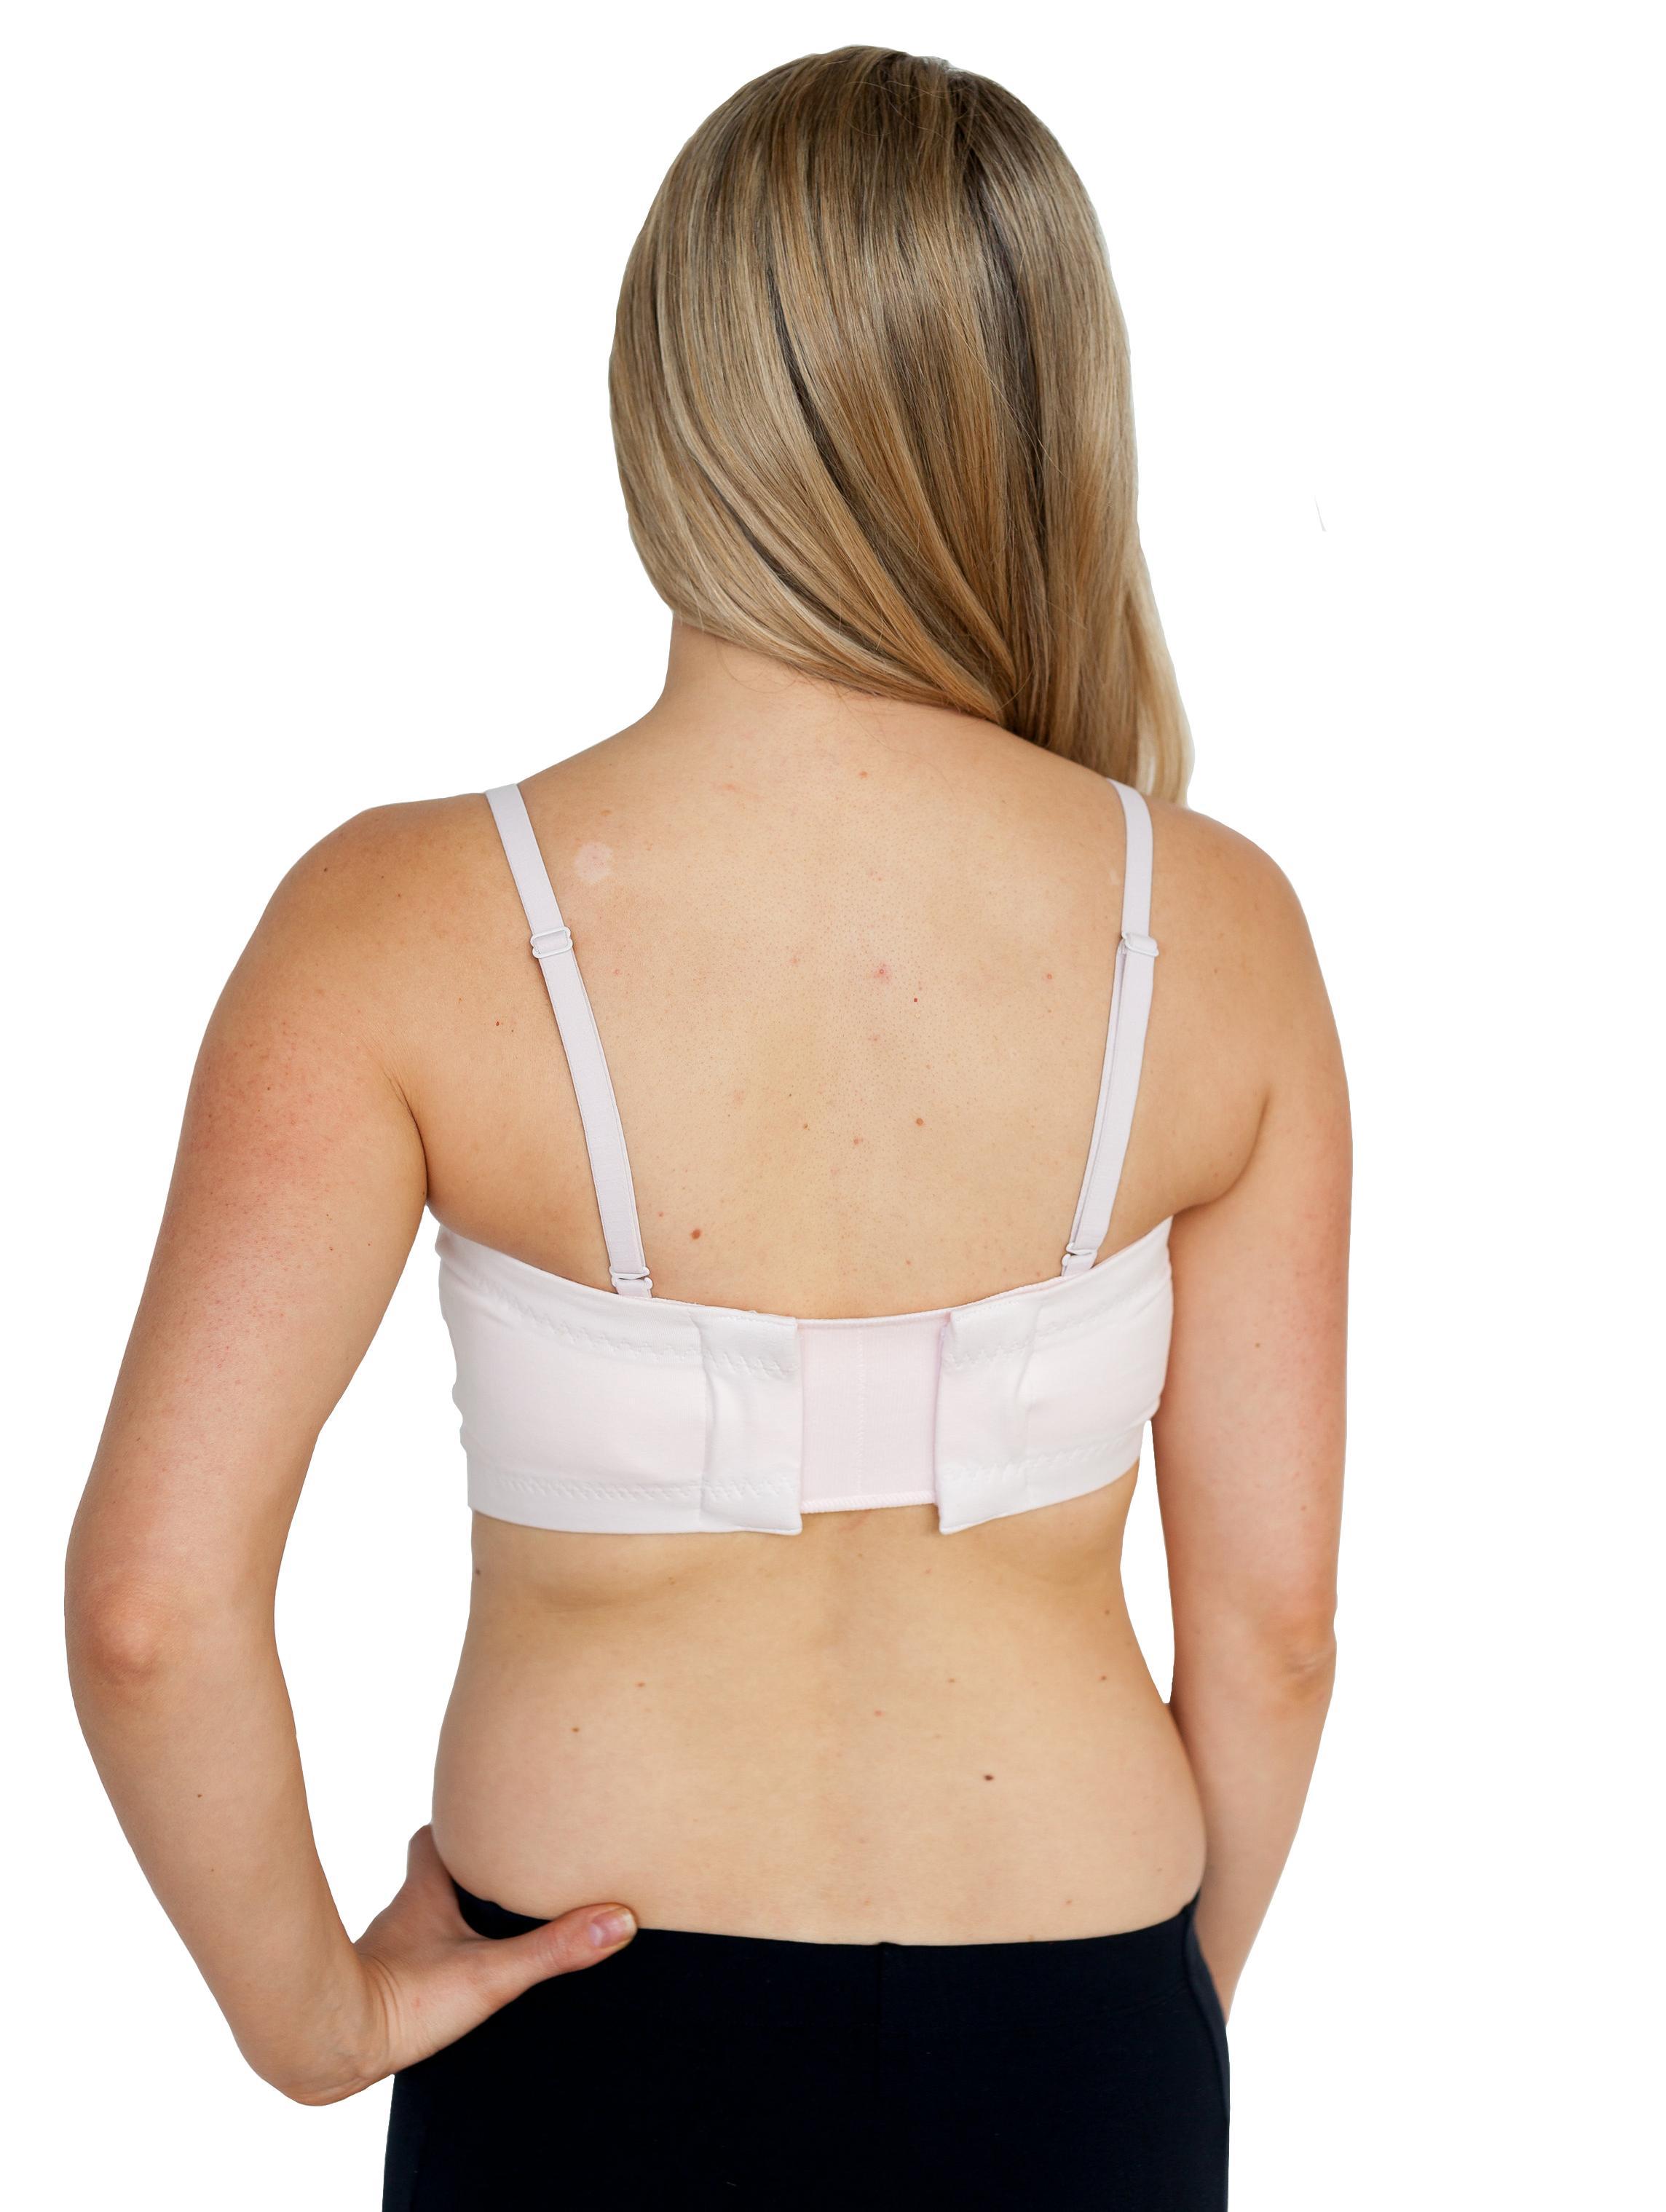 how to make a breast pump bra